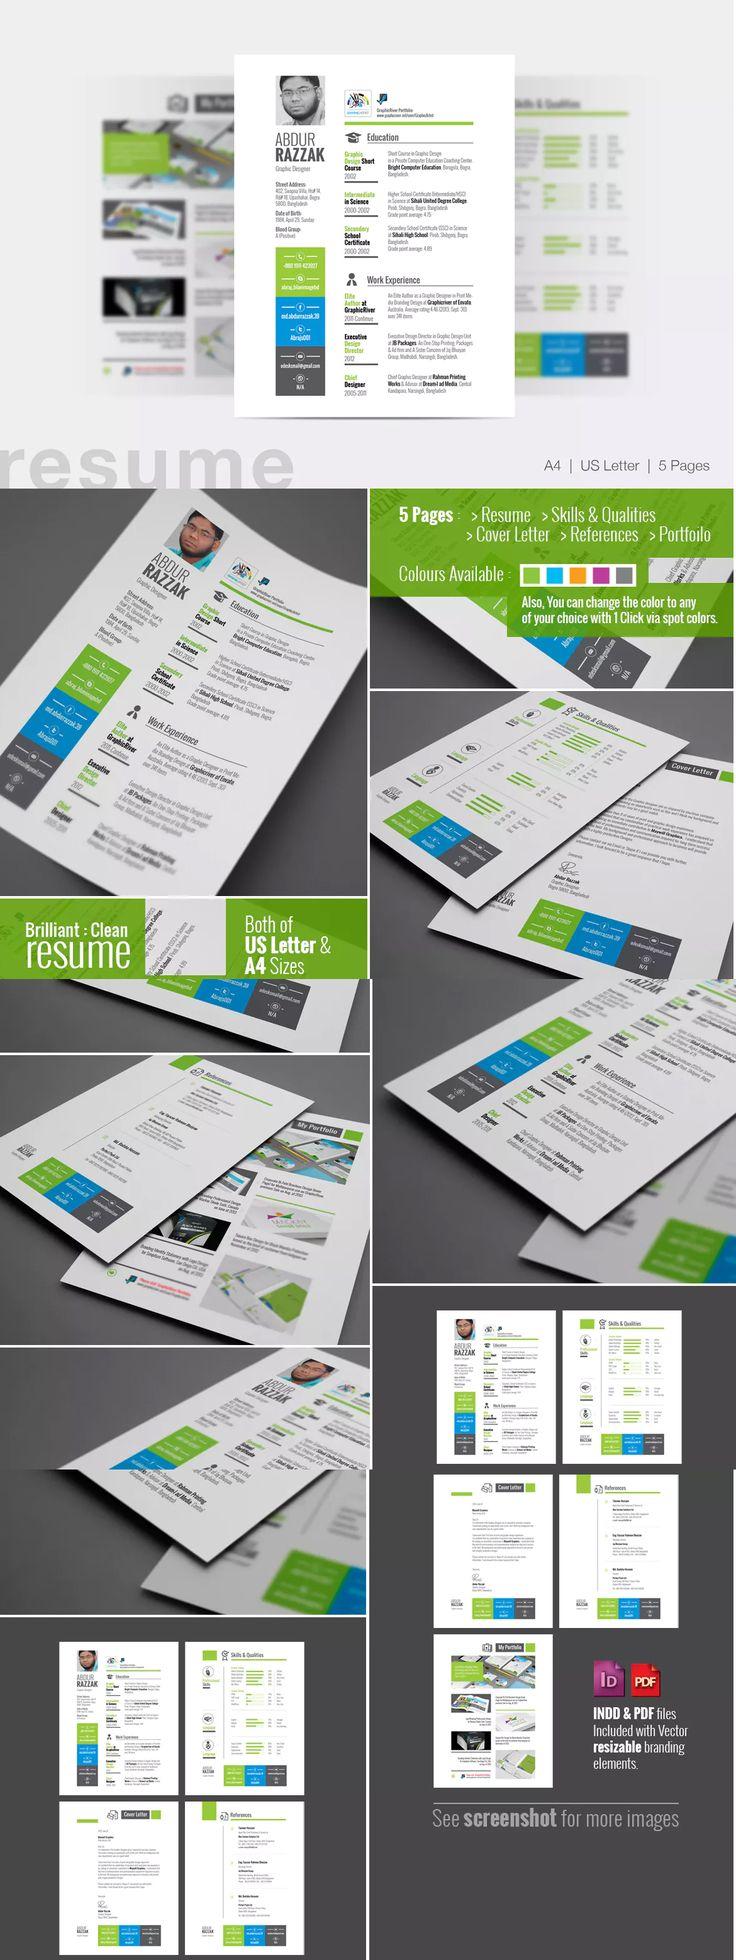 Mejores 166 imágenes de Resume Templates en Pinterest | Currículum ...